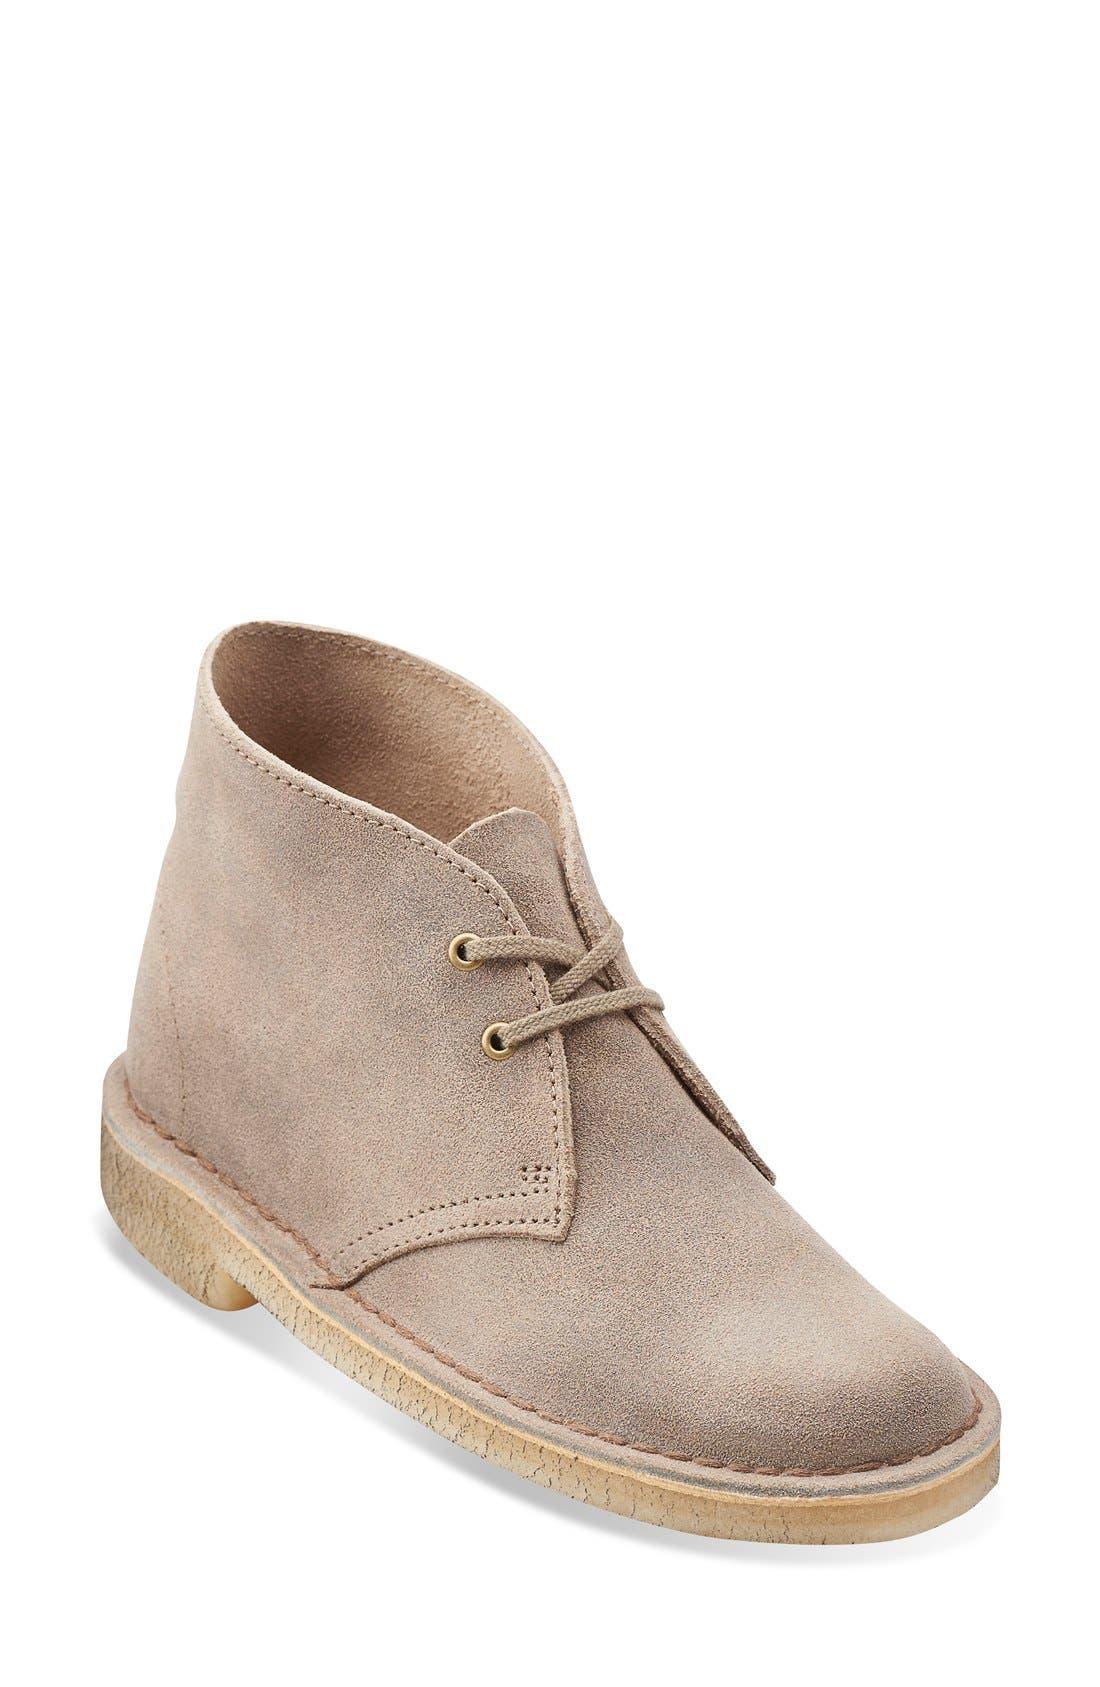 Clarks® Originals Desert Boot (Women)